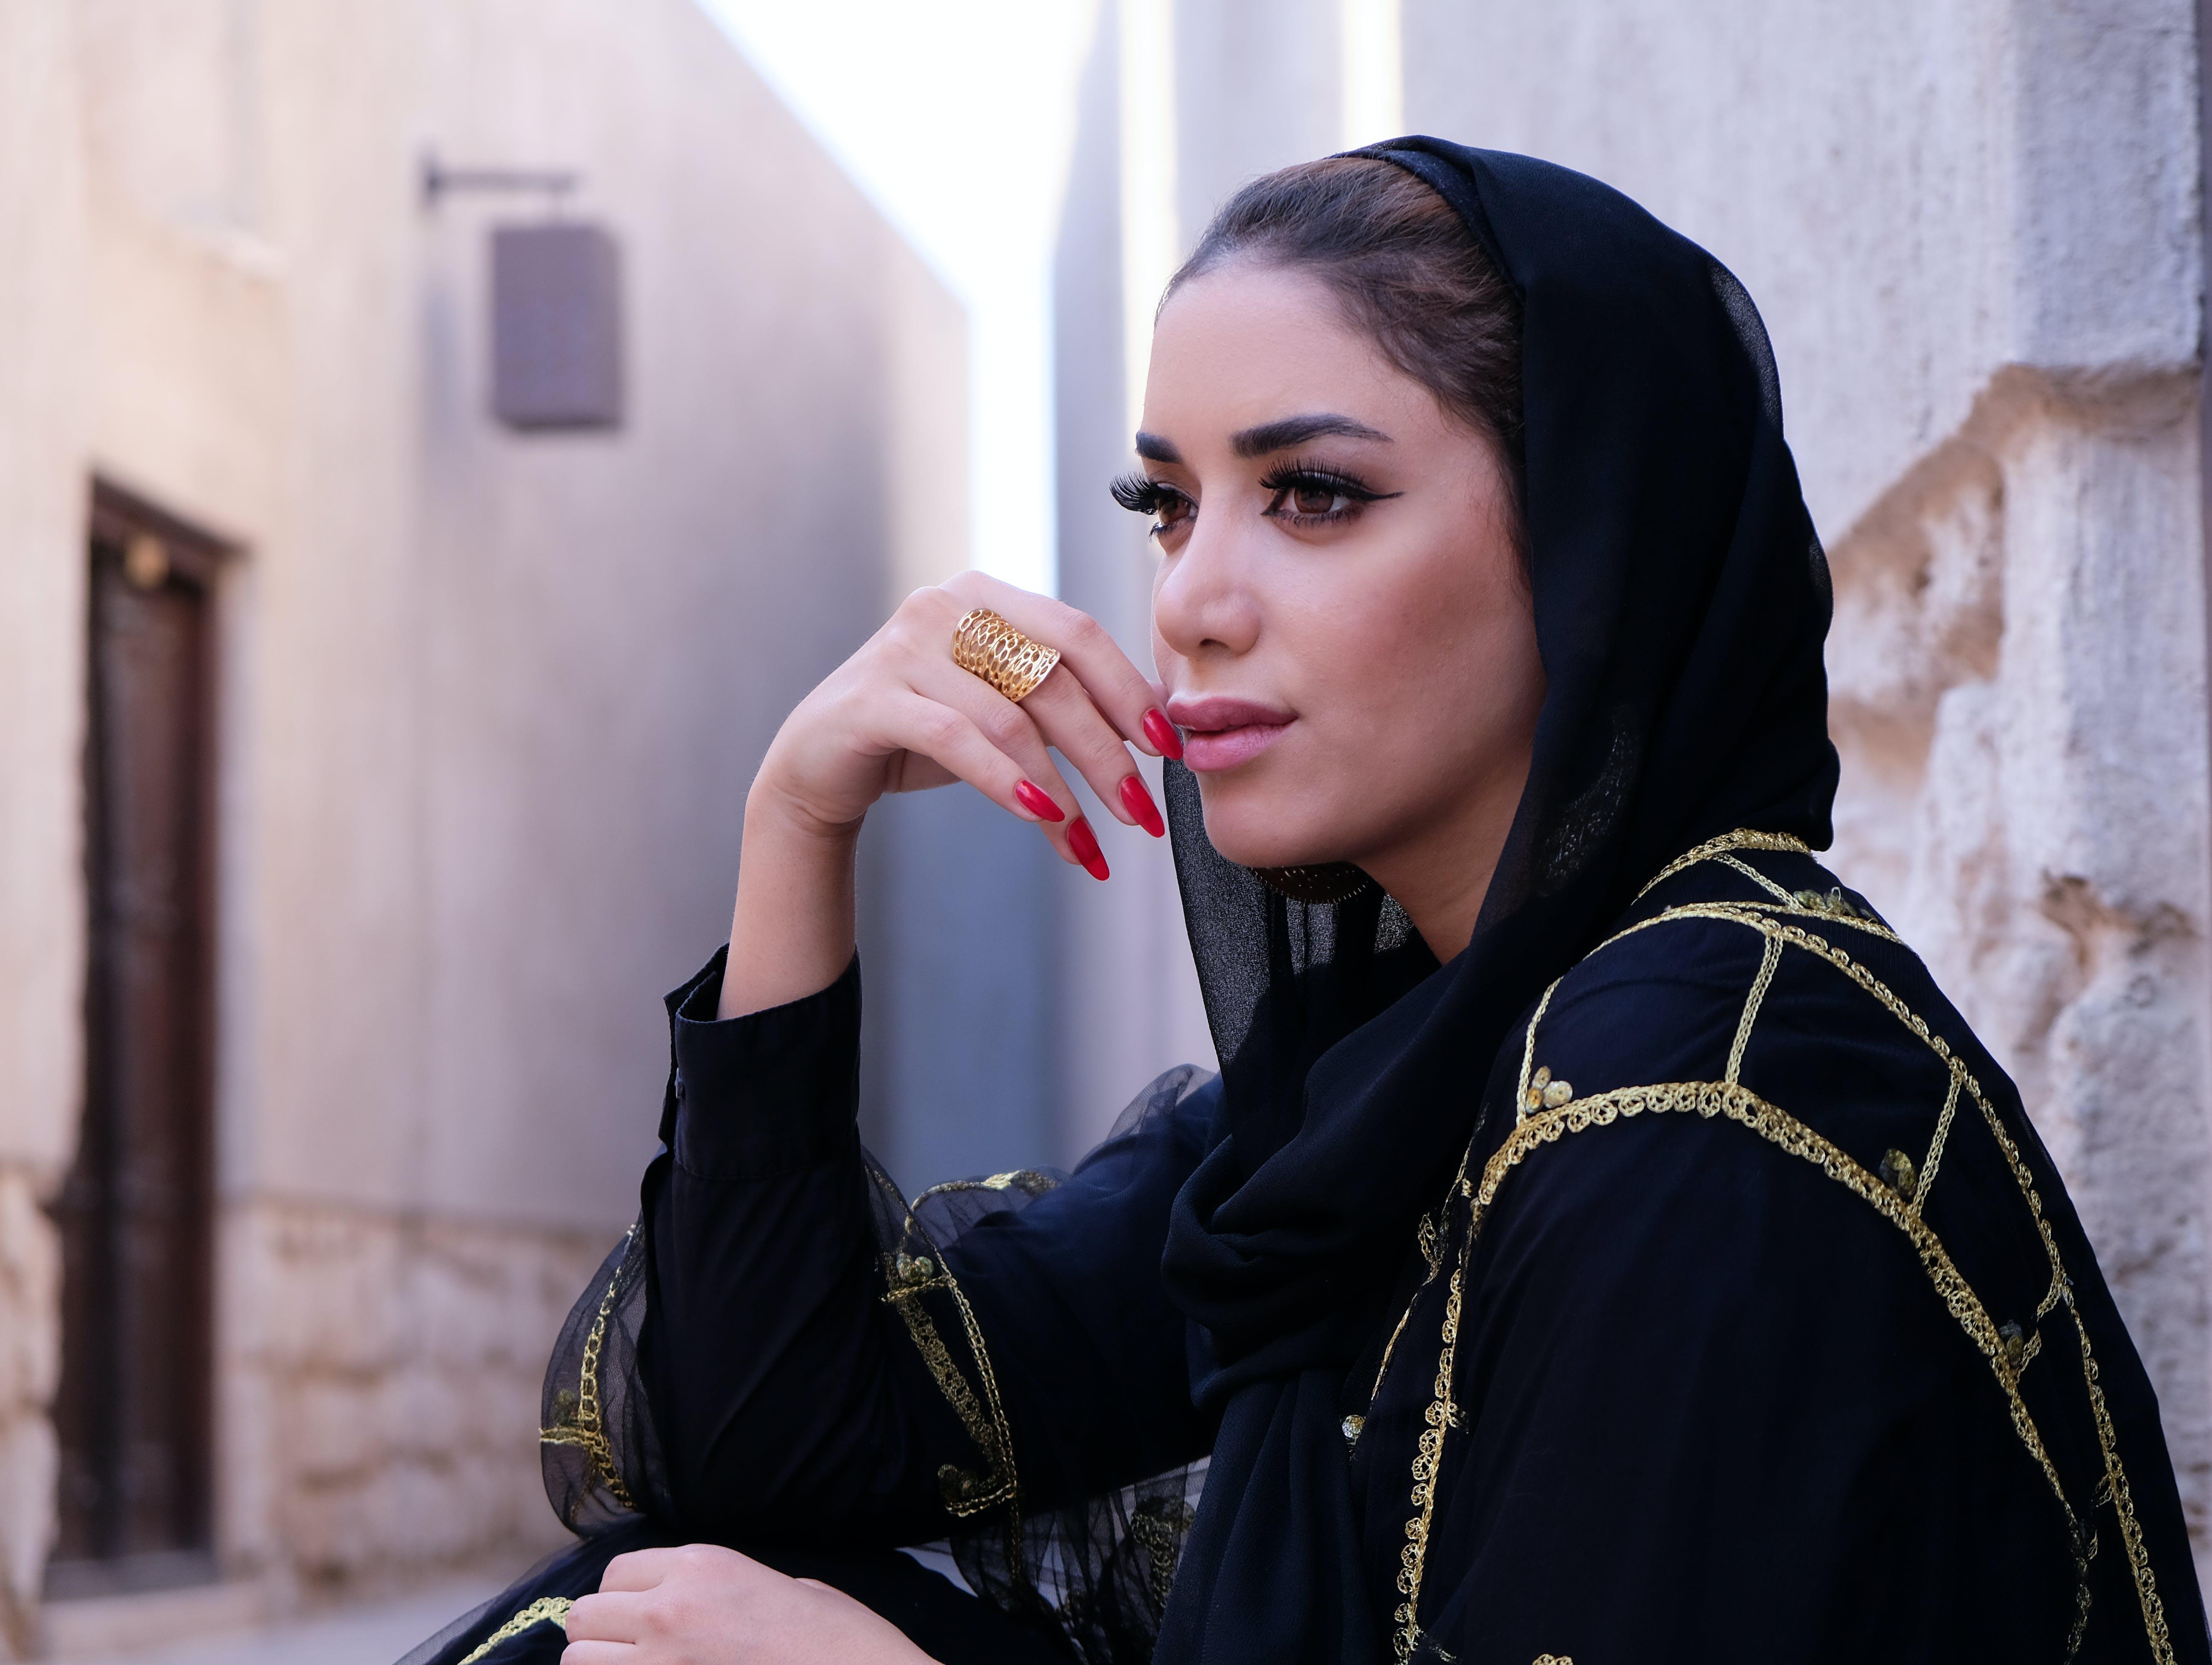 Closeup Photo of Woman Wearing Black Hijab Headdress Holding Her Lips